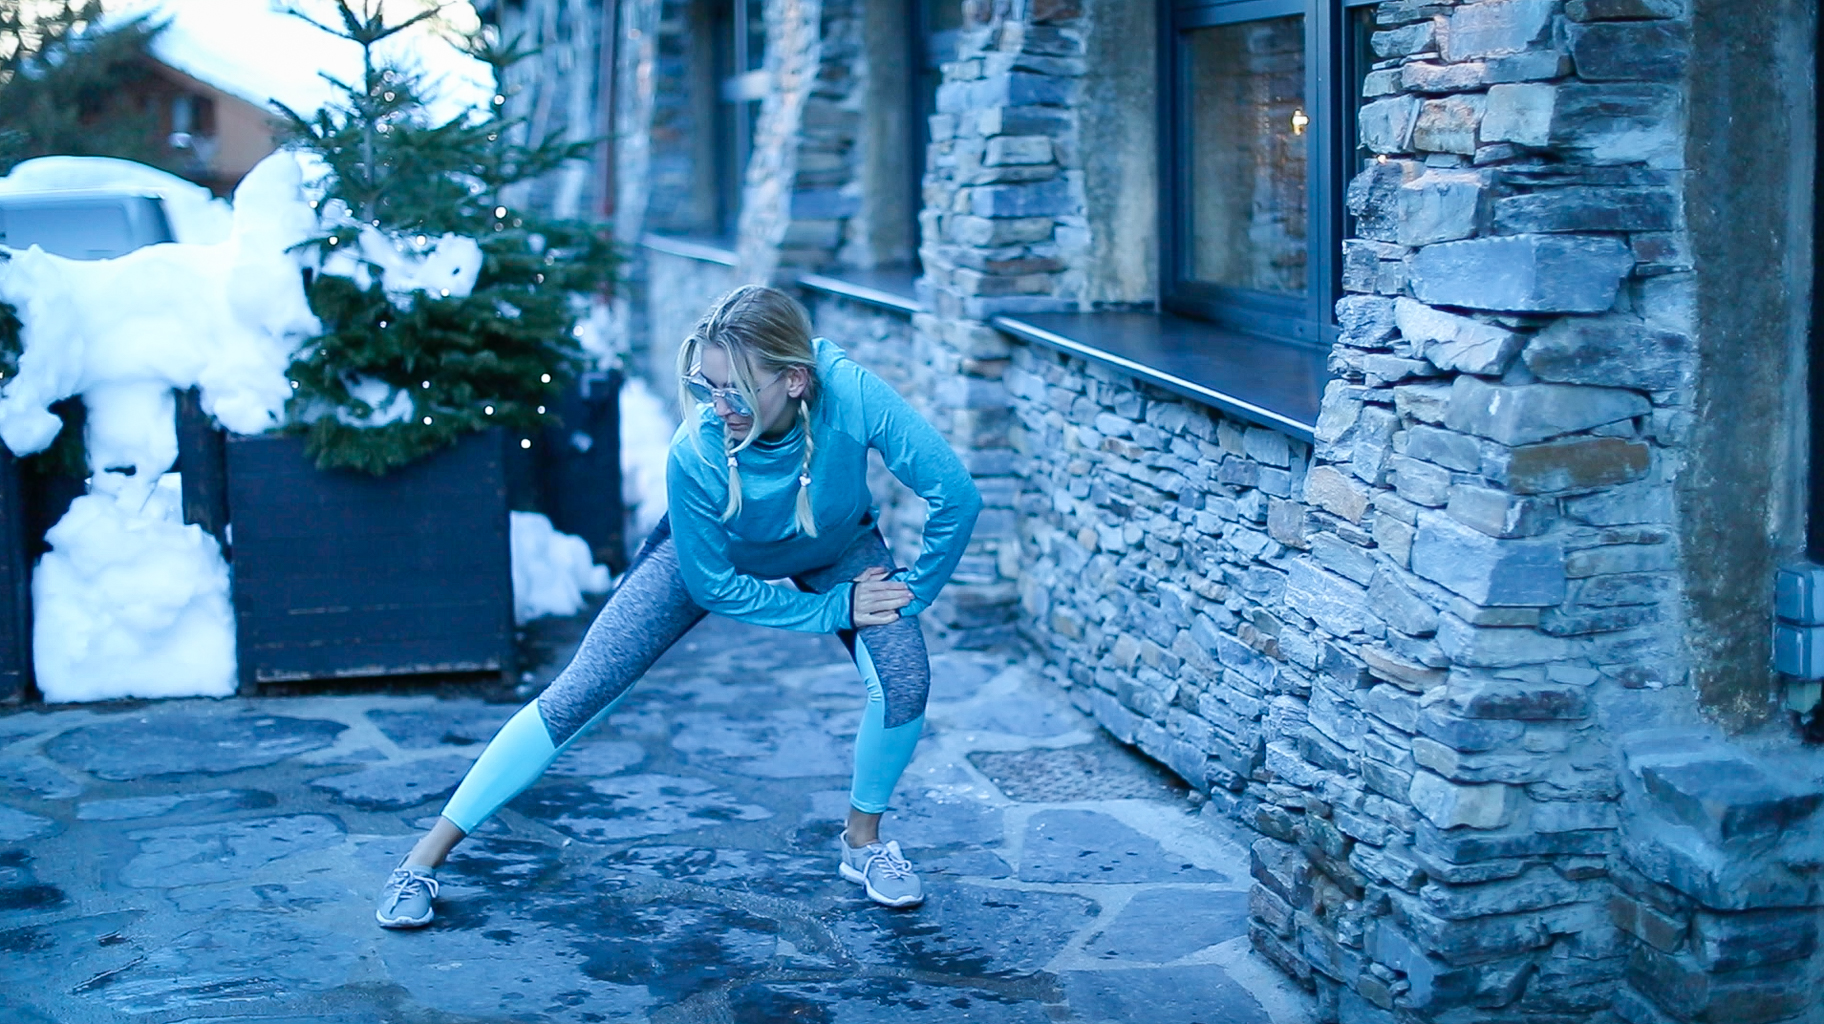 Fitness On Toast Faya Blog Girl Healthy Workout Matalan Images Power of Movement Benefits Walk Power Bodyweight Training-14